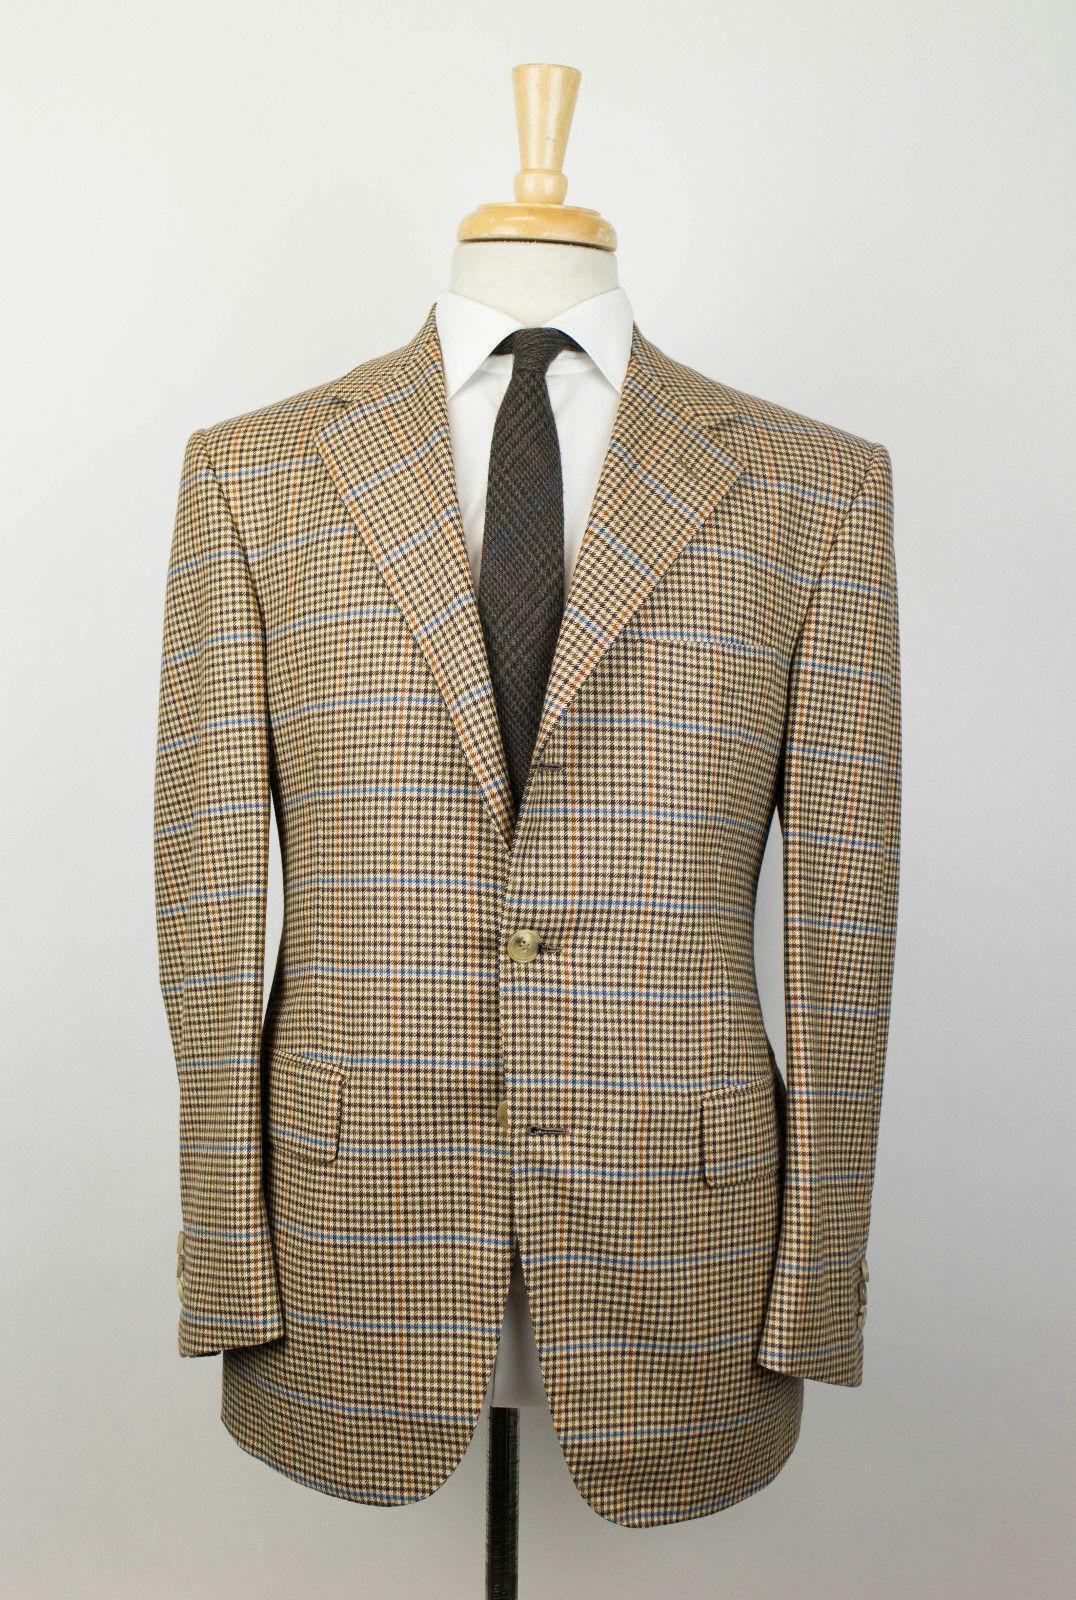 New D'AVENZA braun wolle3 Roll 2 Button Sport Coat Blazer 50 40 R Drop 3  2995